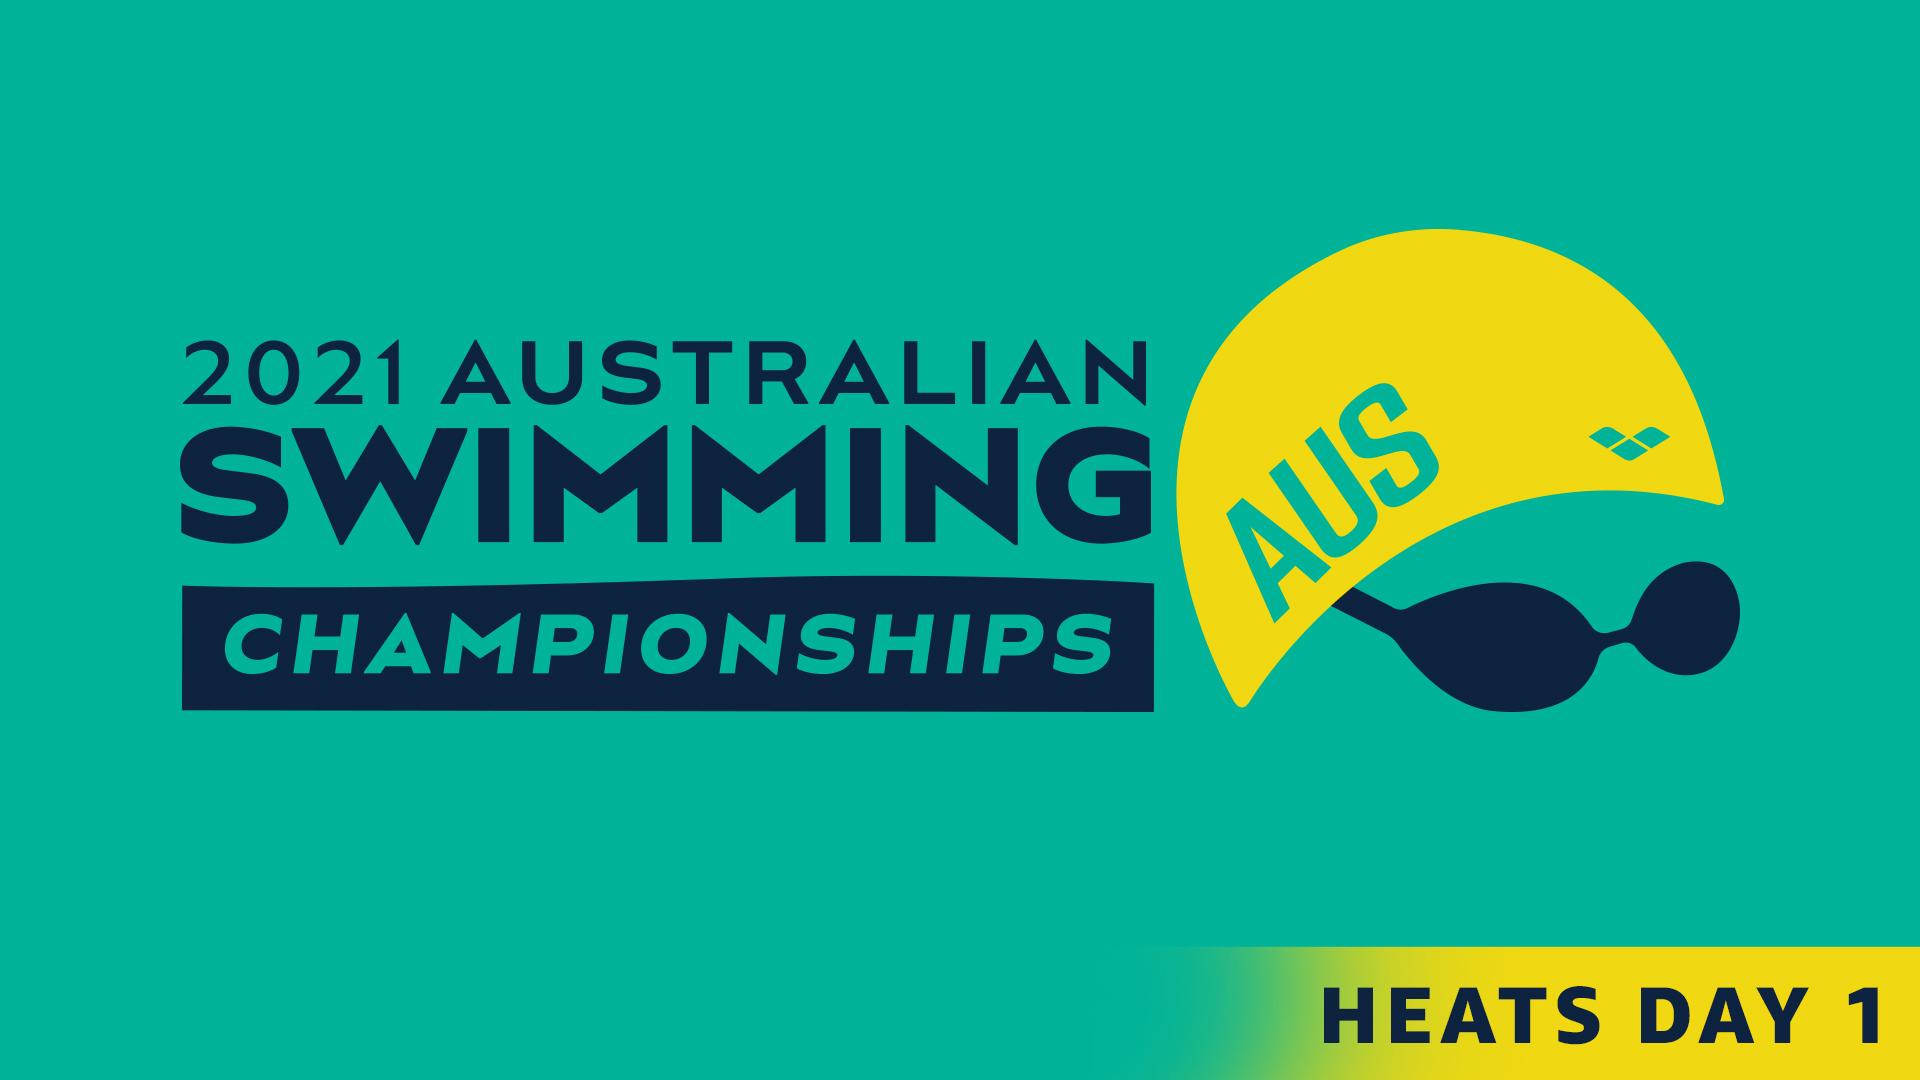 Australian Swimming Championships: Day 1 Heats